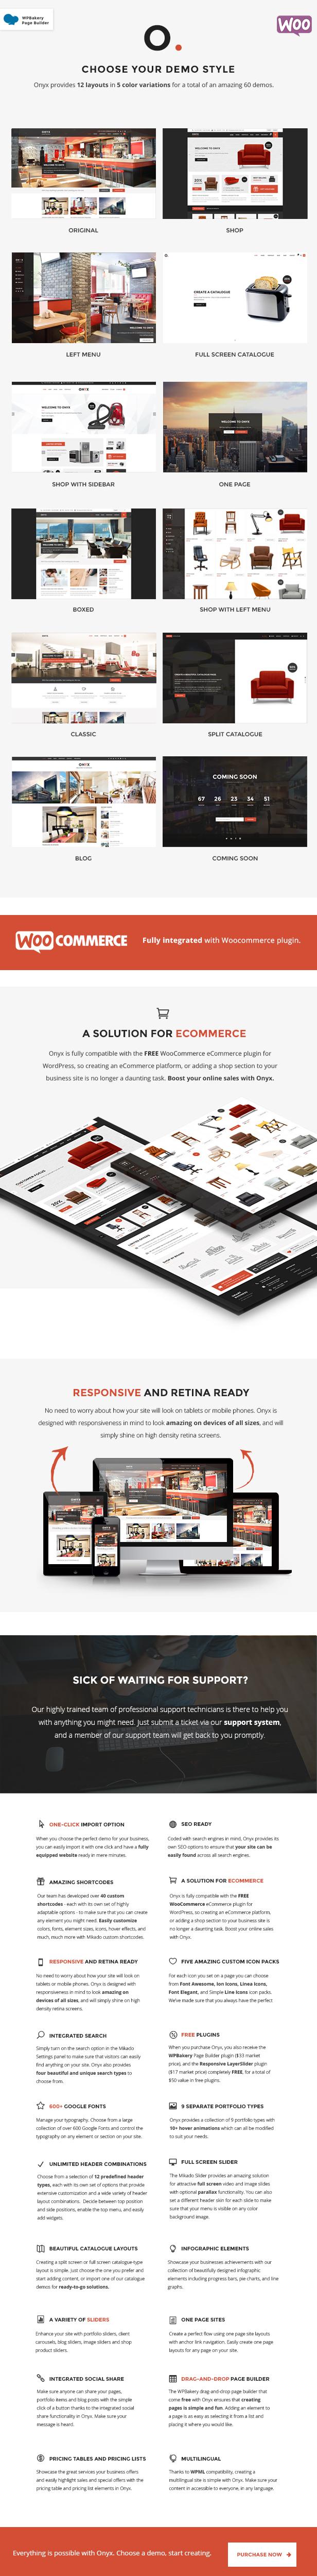 Onyx - Multi-Concept Business Theme - 1